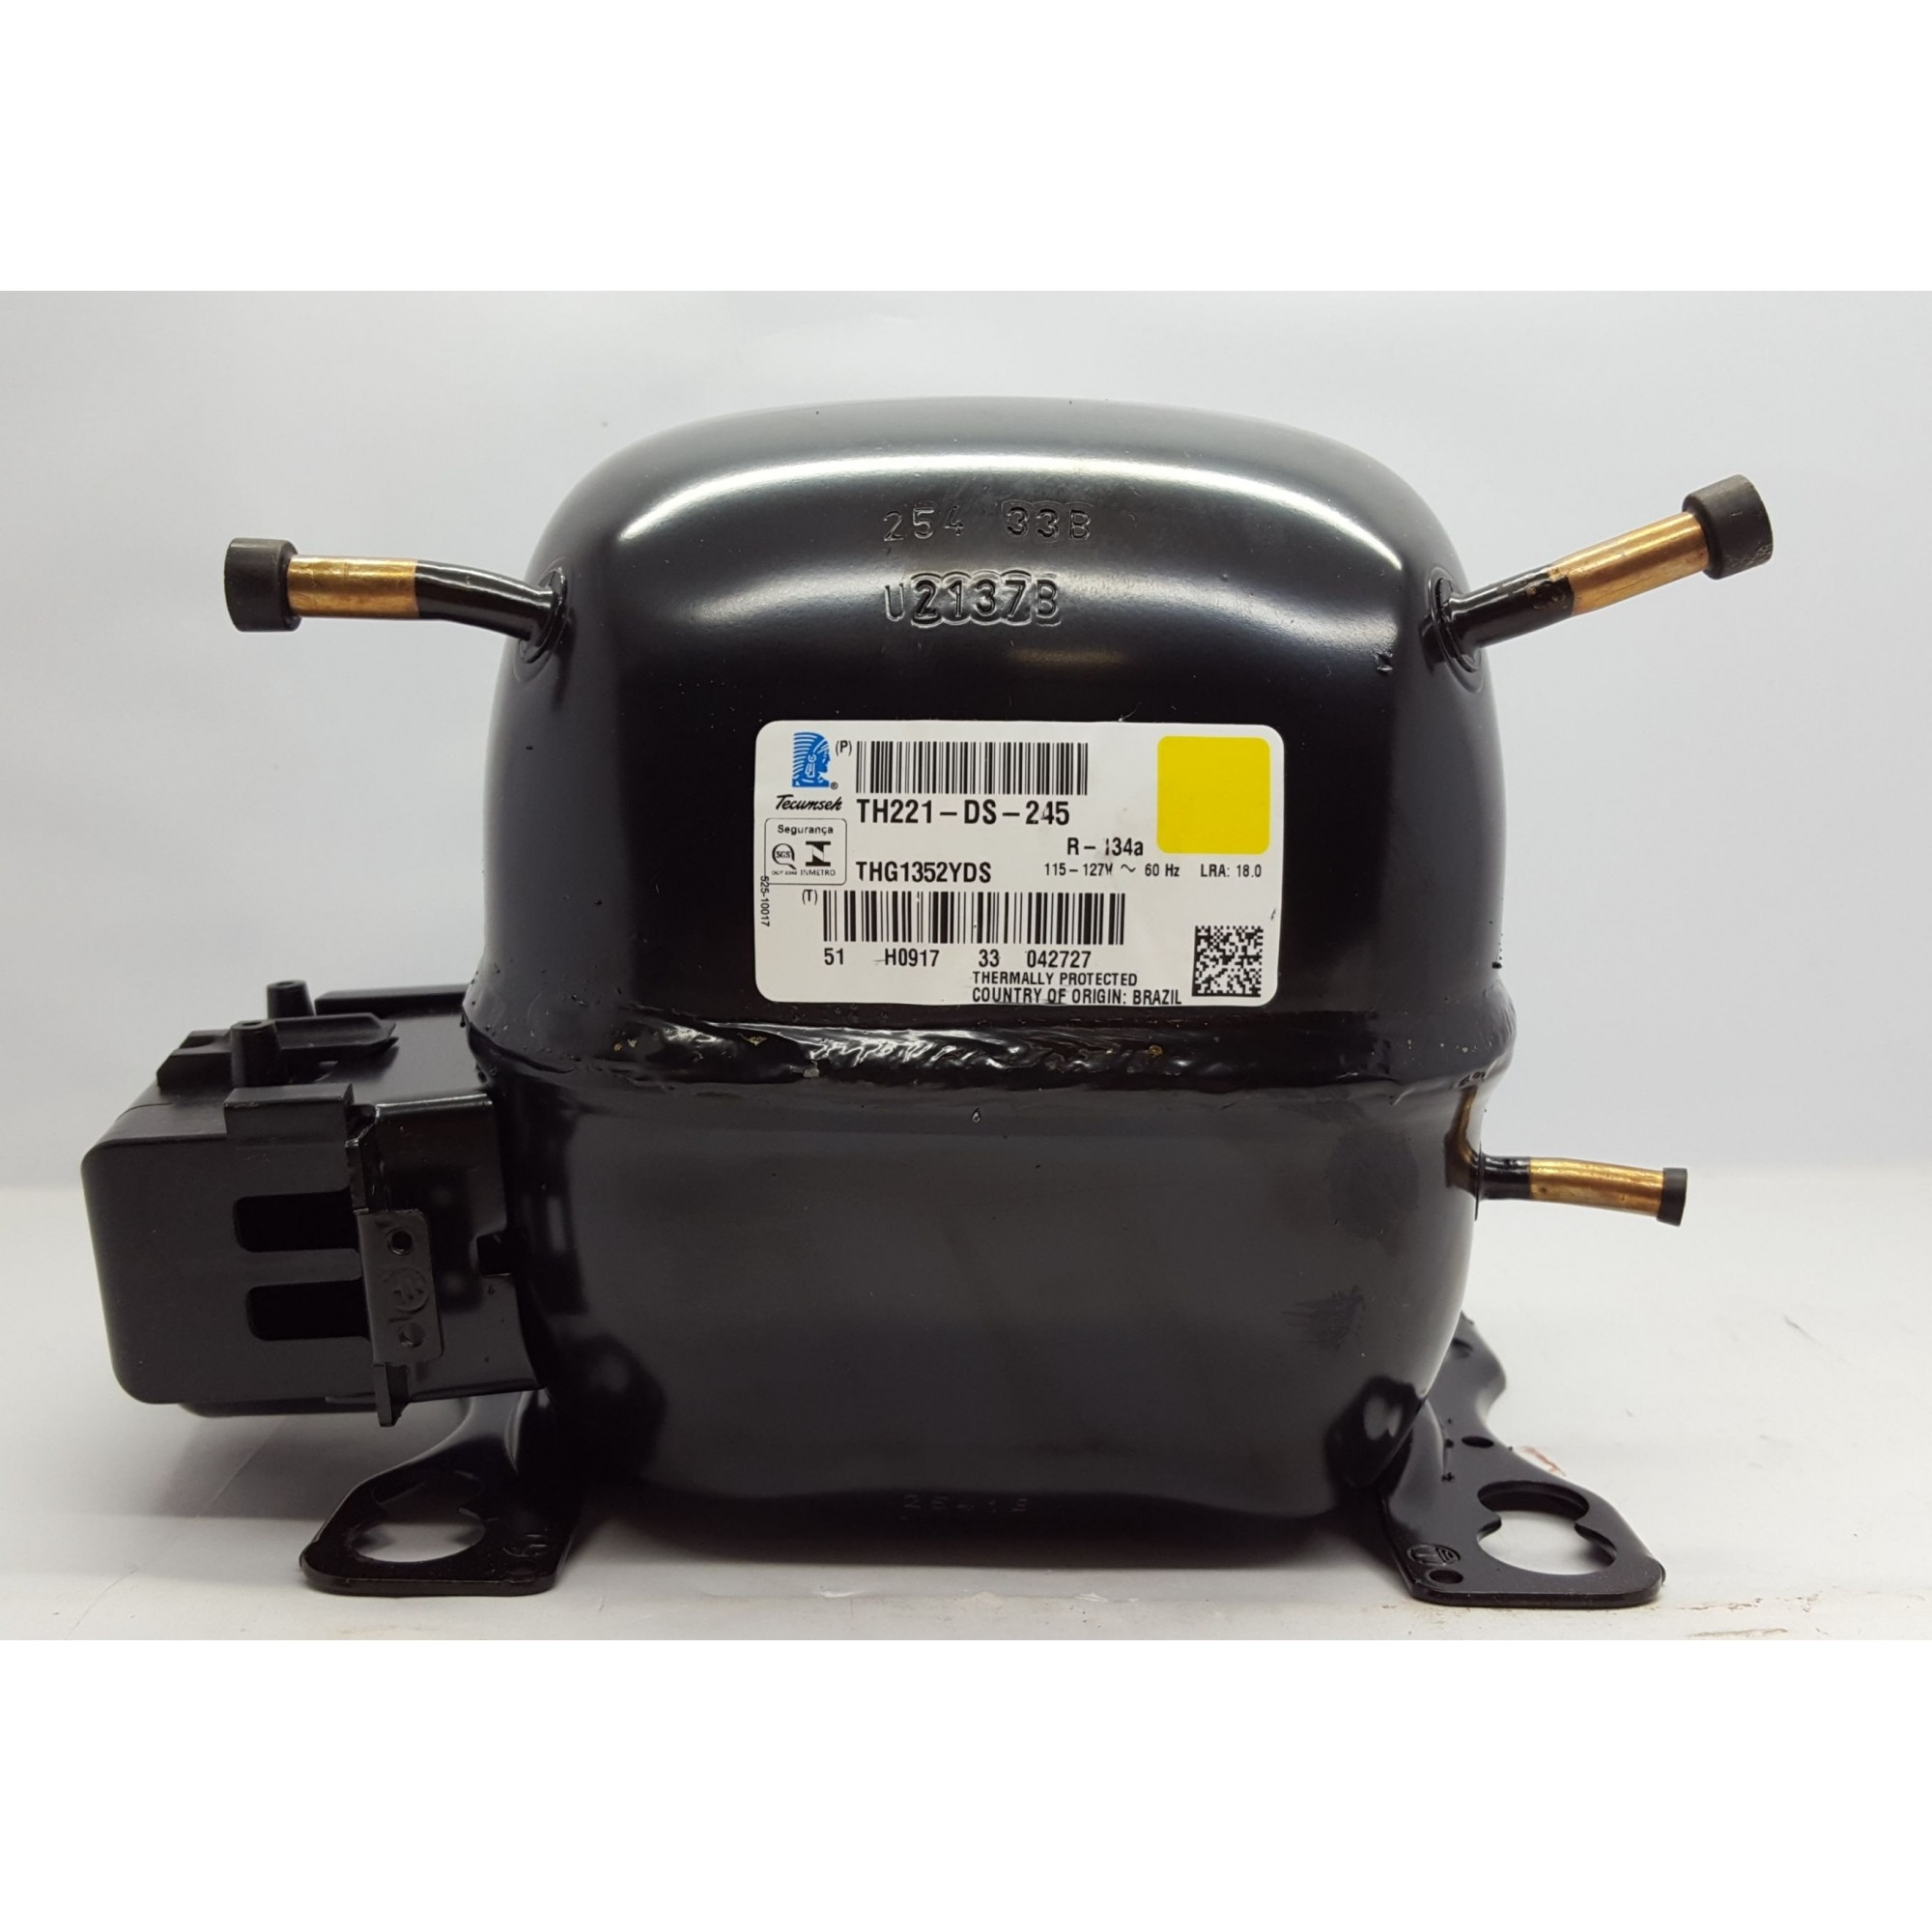 MOTOR COMPRESSOR TECUMSEH 1/6 HP - THG1352YDS - R-134a (110v)